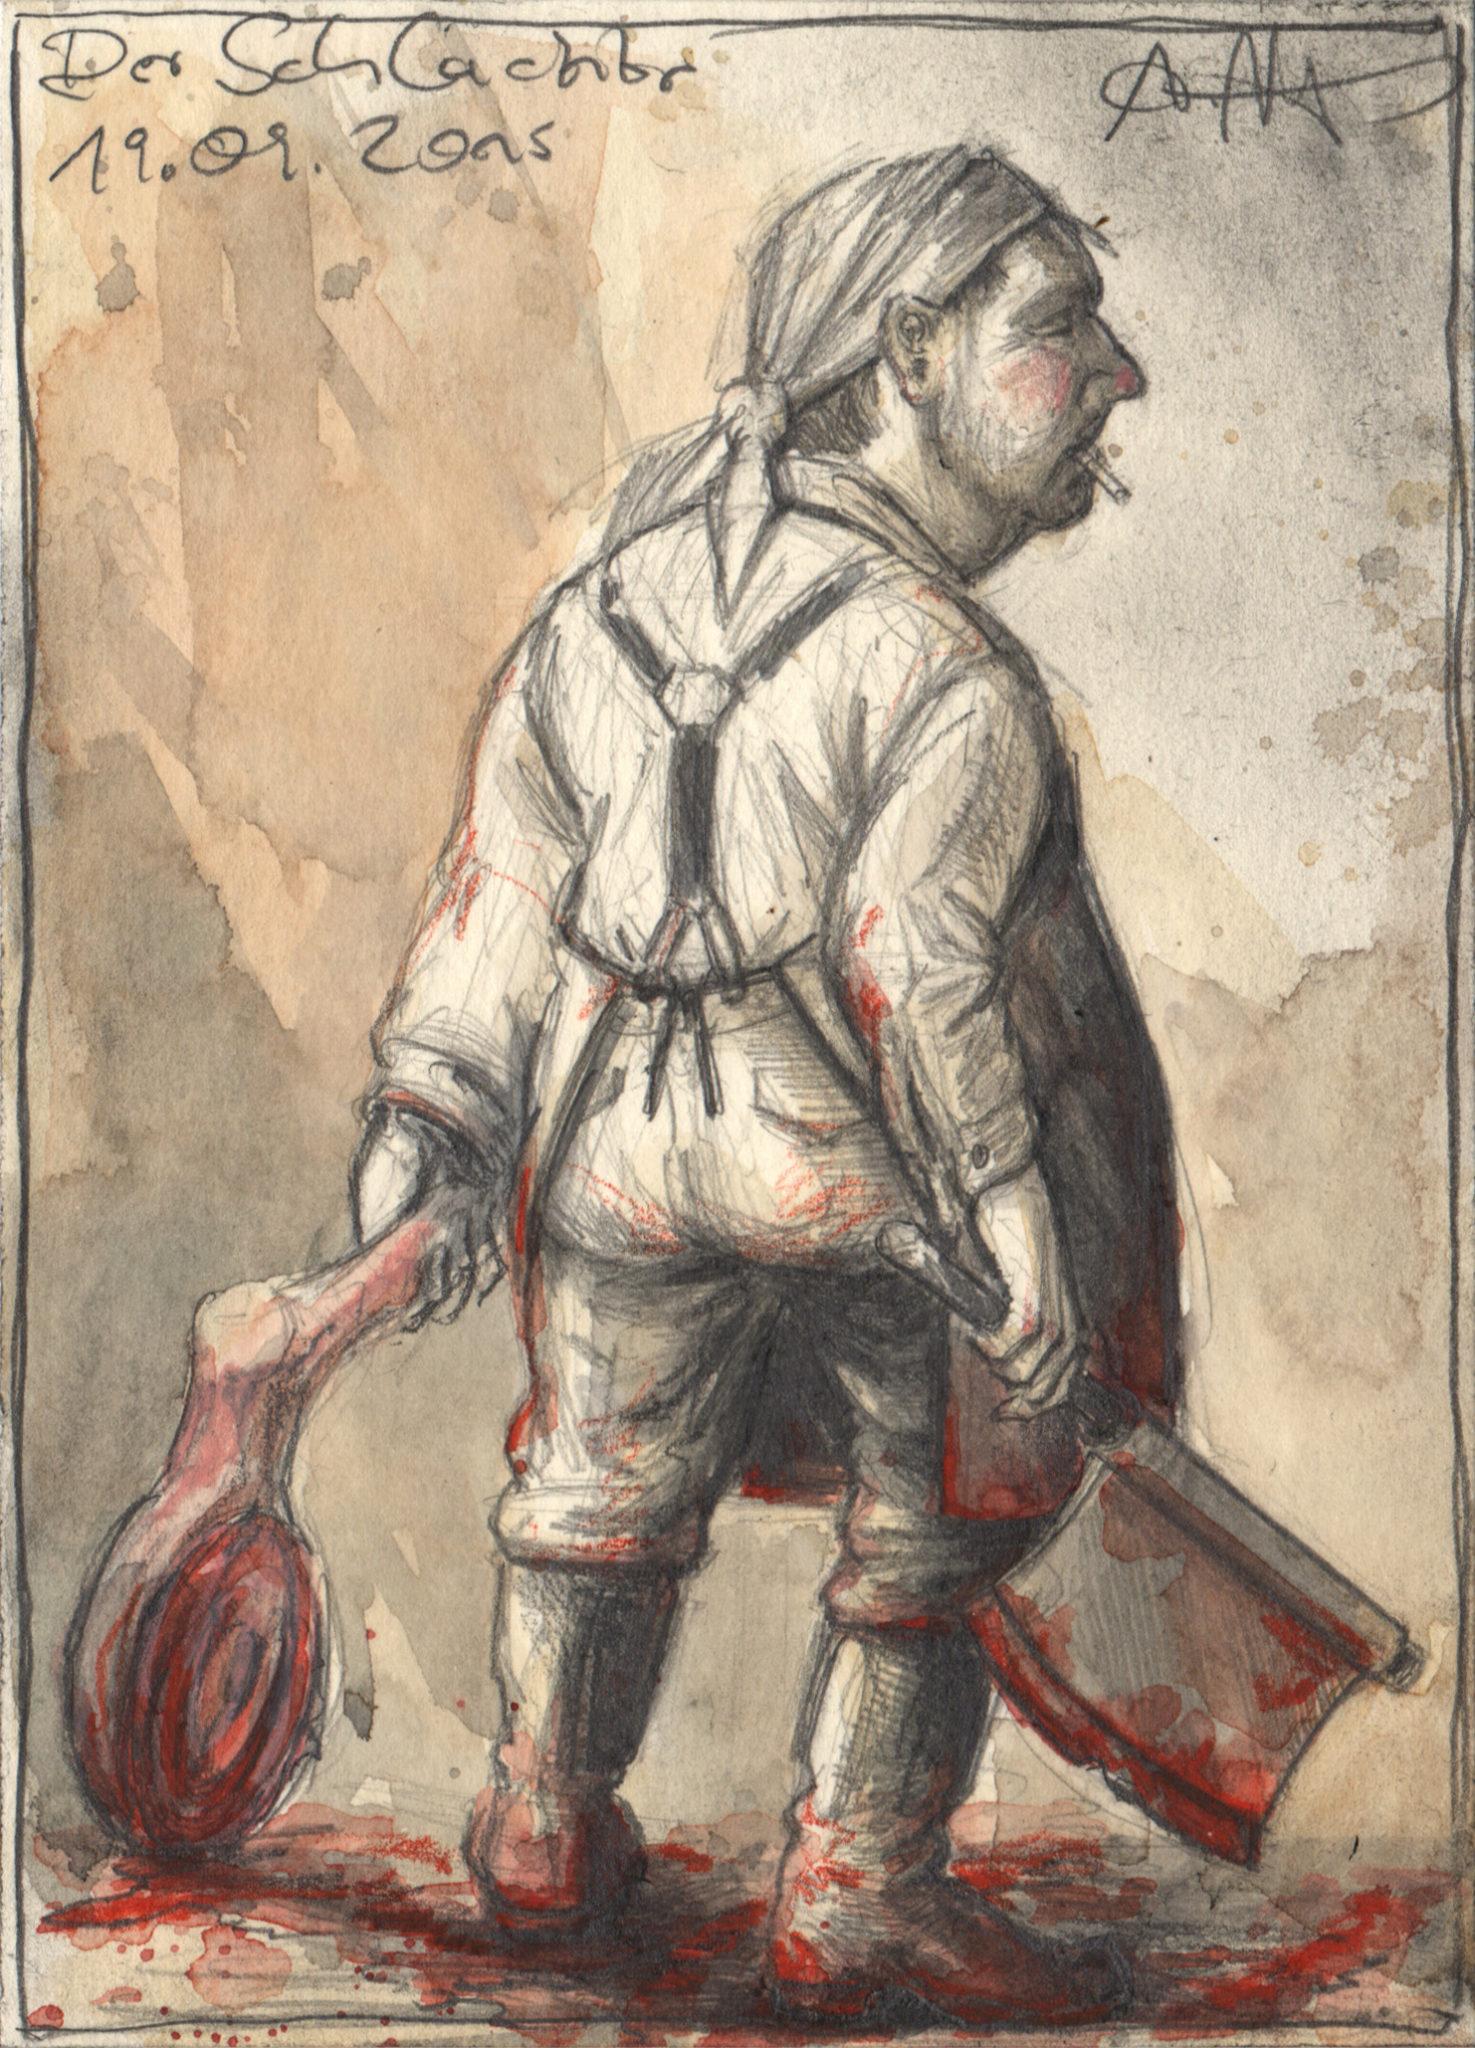 Man of the Slaughterhouse